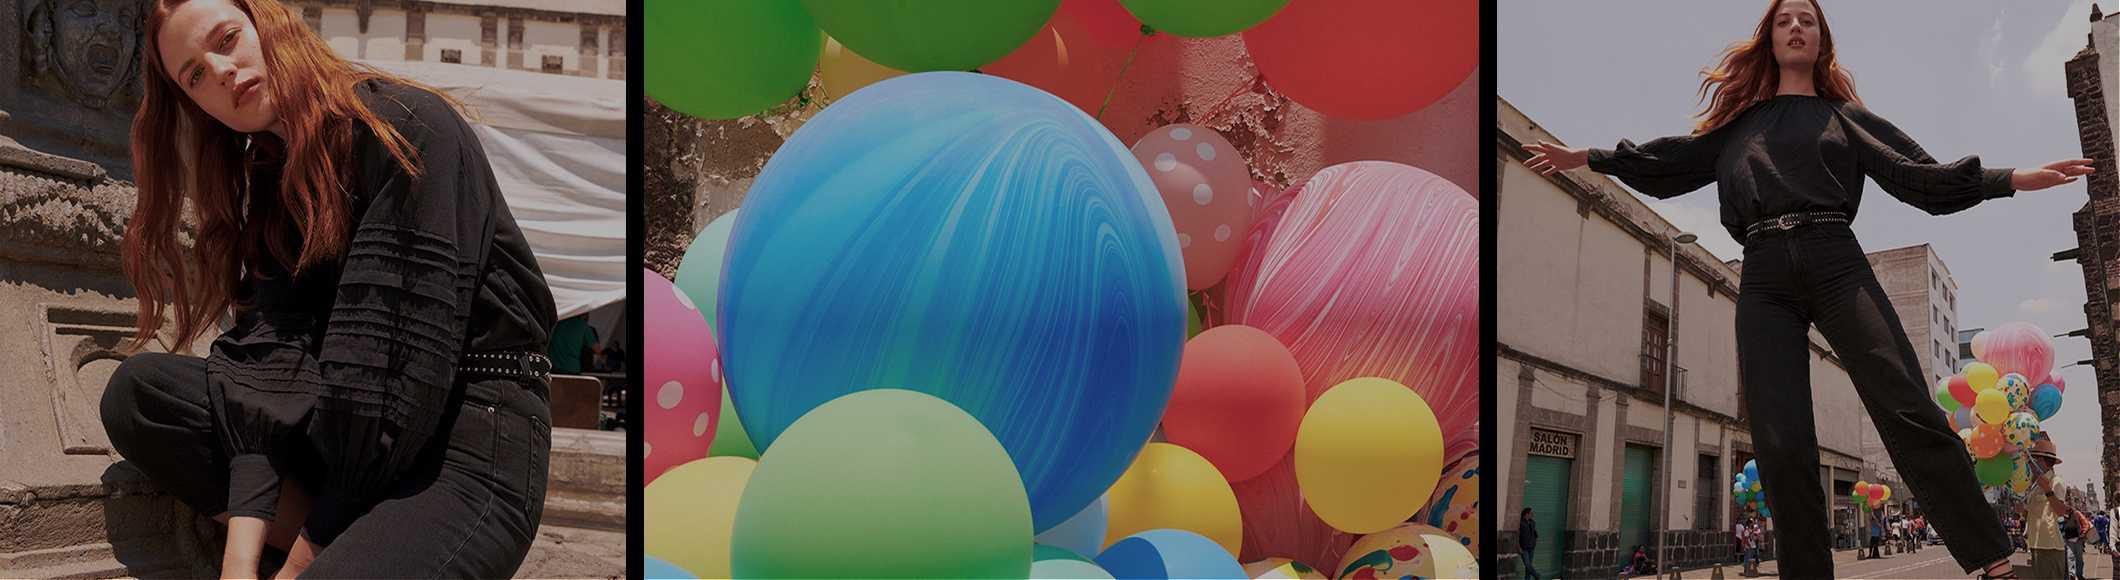 Baloon_Sort